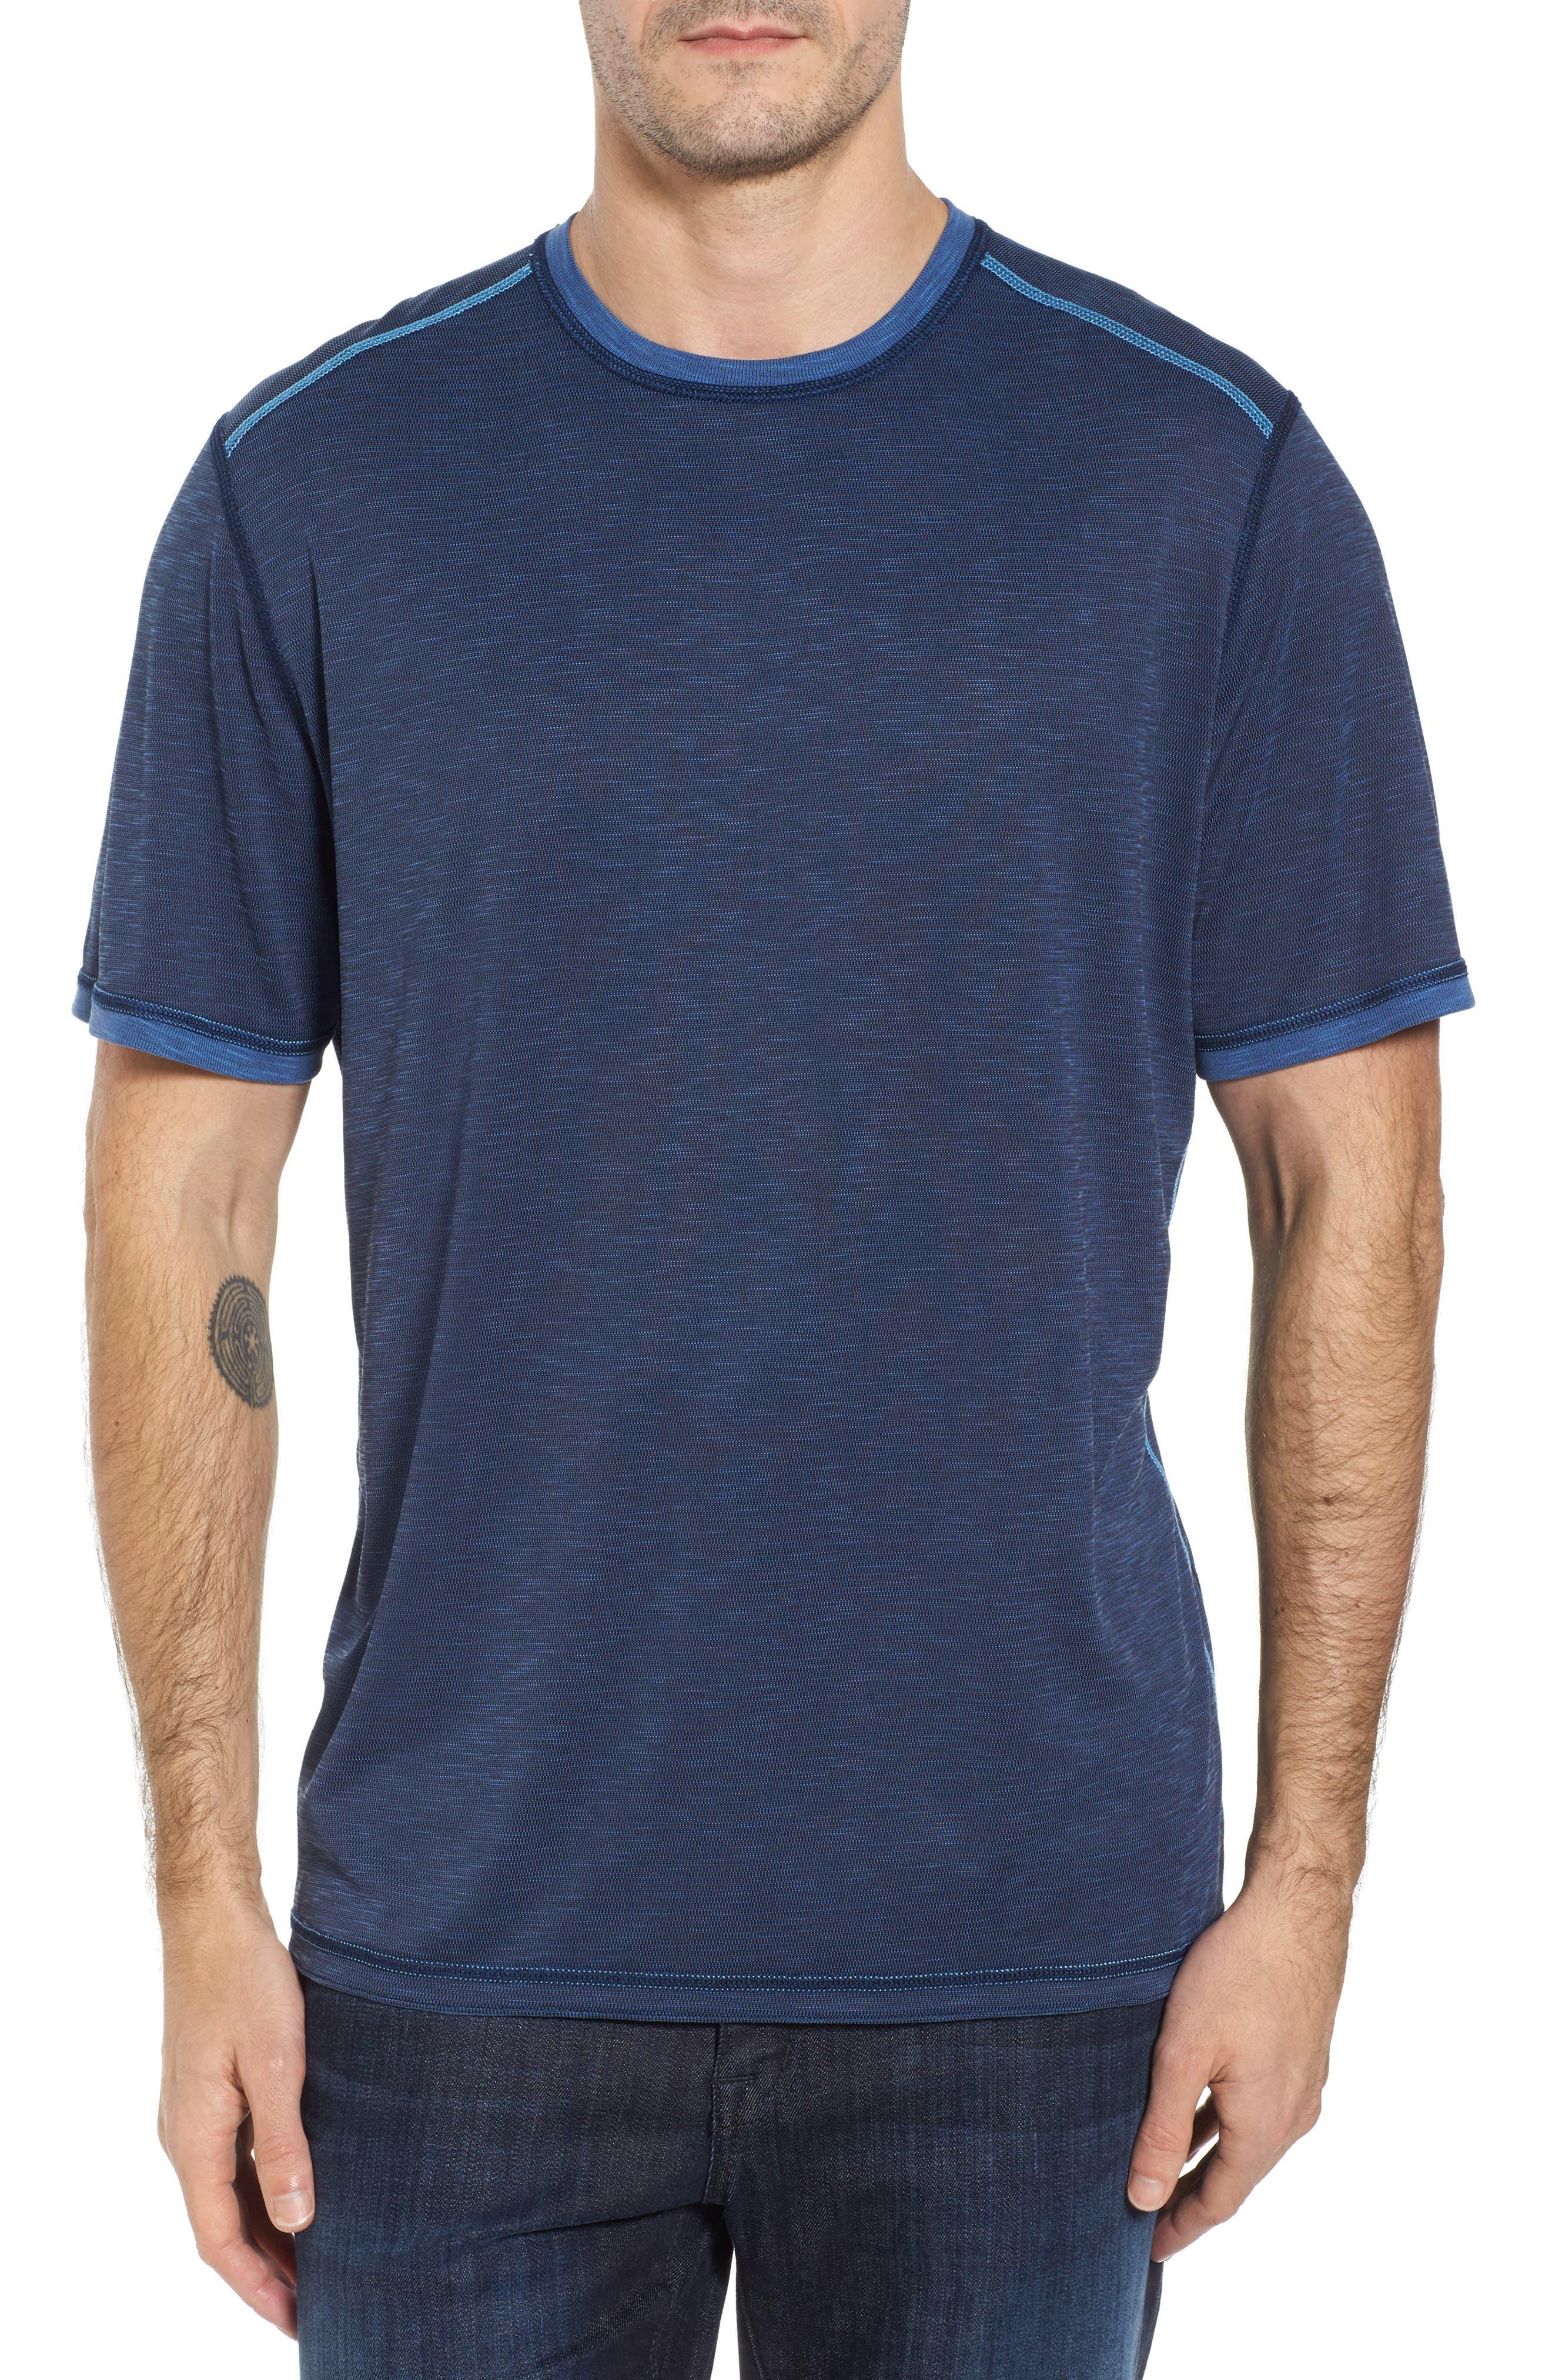 Flip Tide T-Shirt,                             Alternate thumbnail 2, color,                             Galaxy Blue